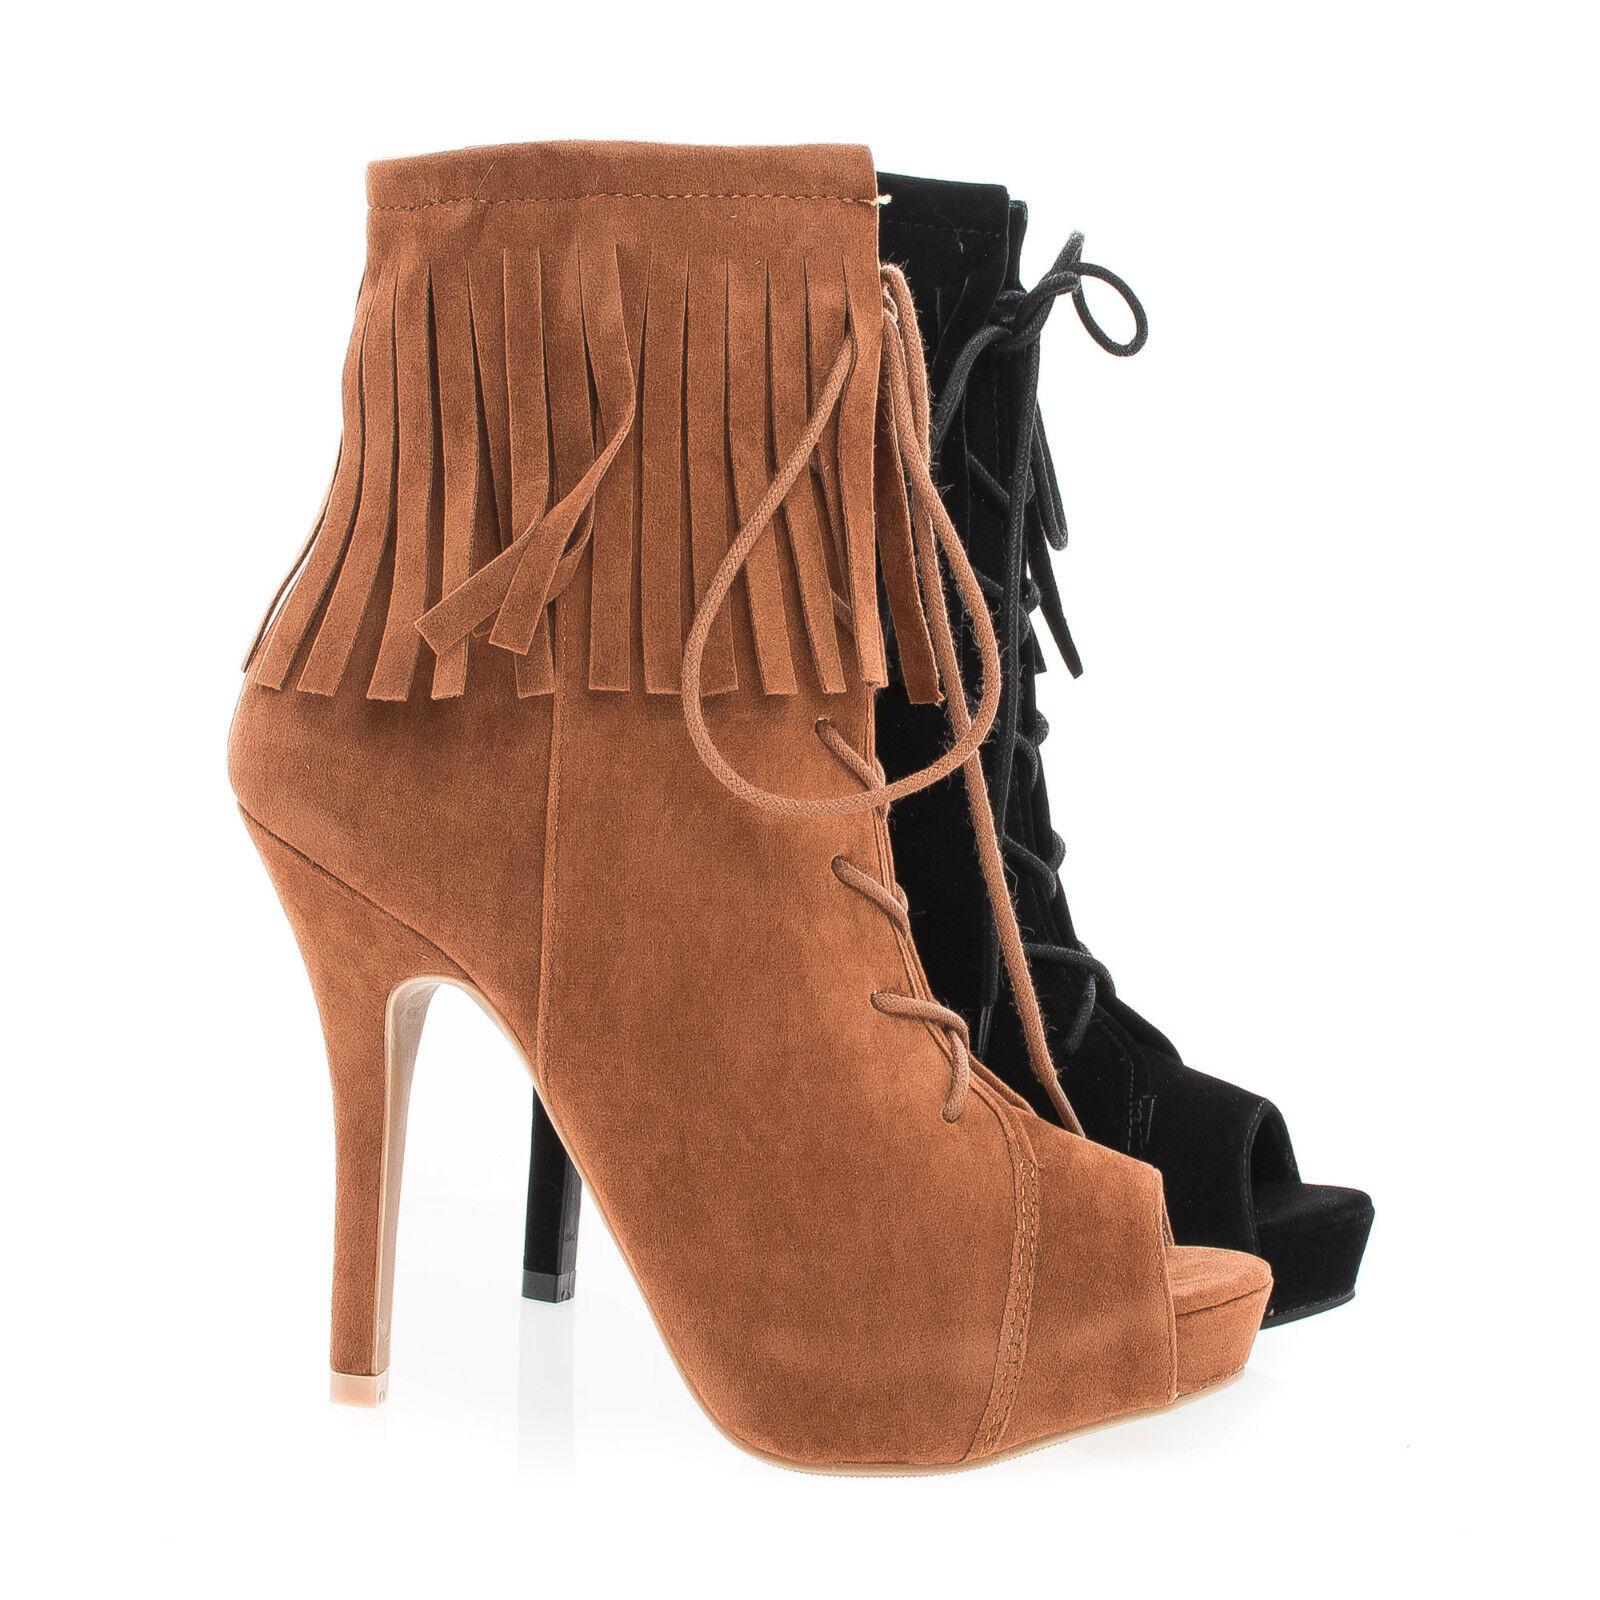 Verdict88 Peep Toe Corset Lace Up Ankle Cuff Fringe Stiletto Booties